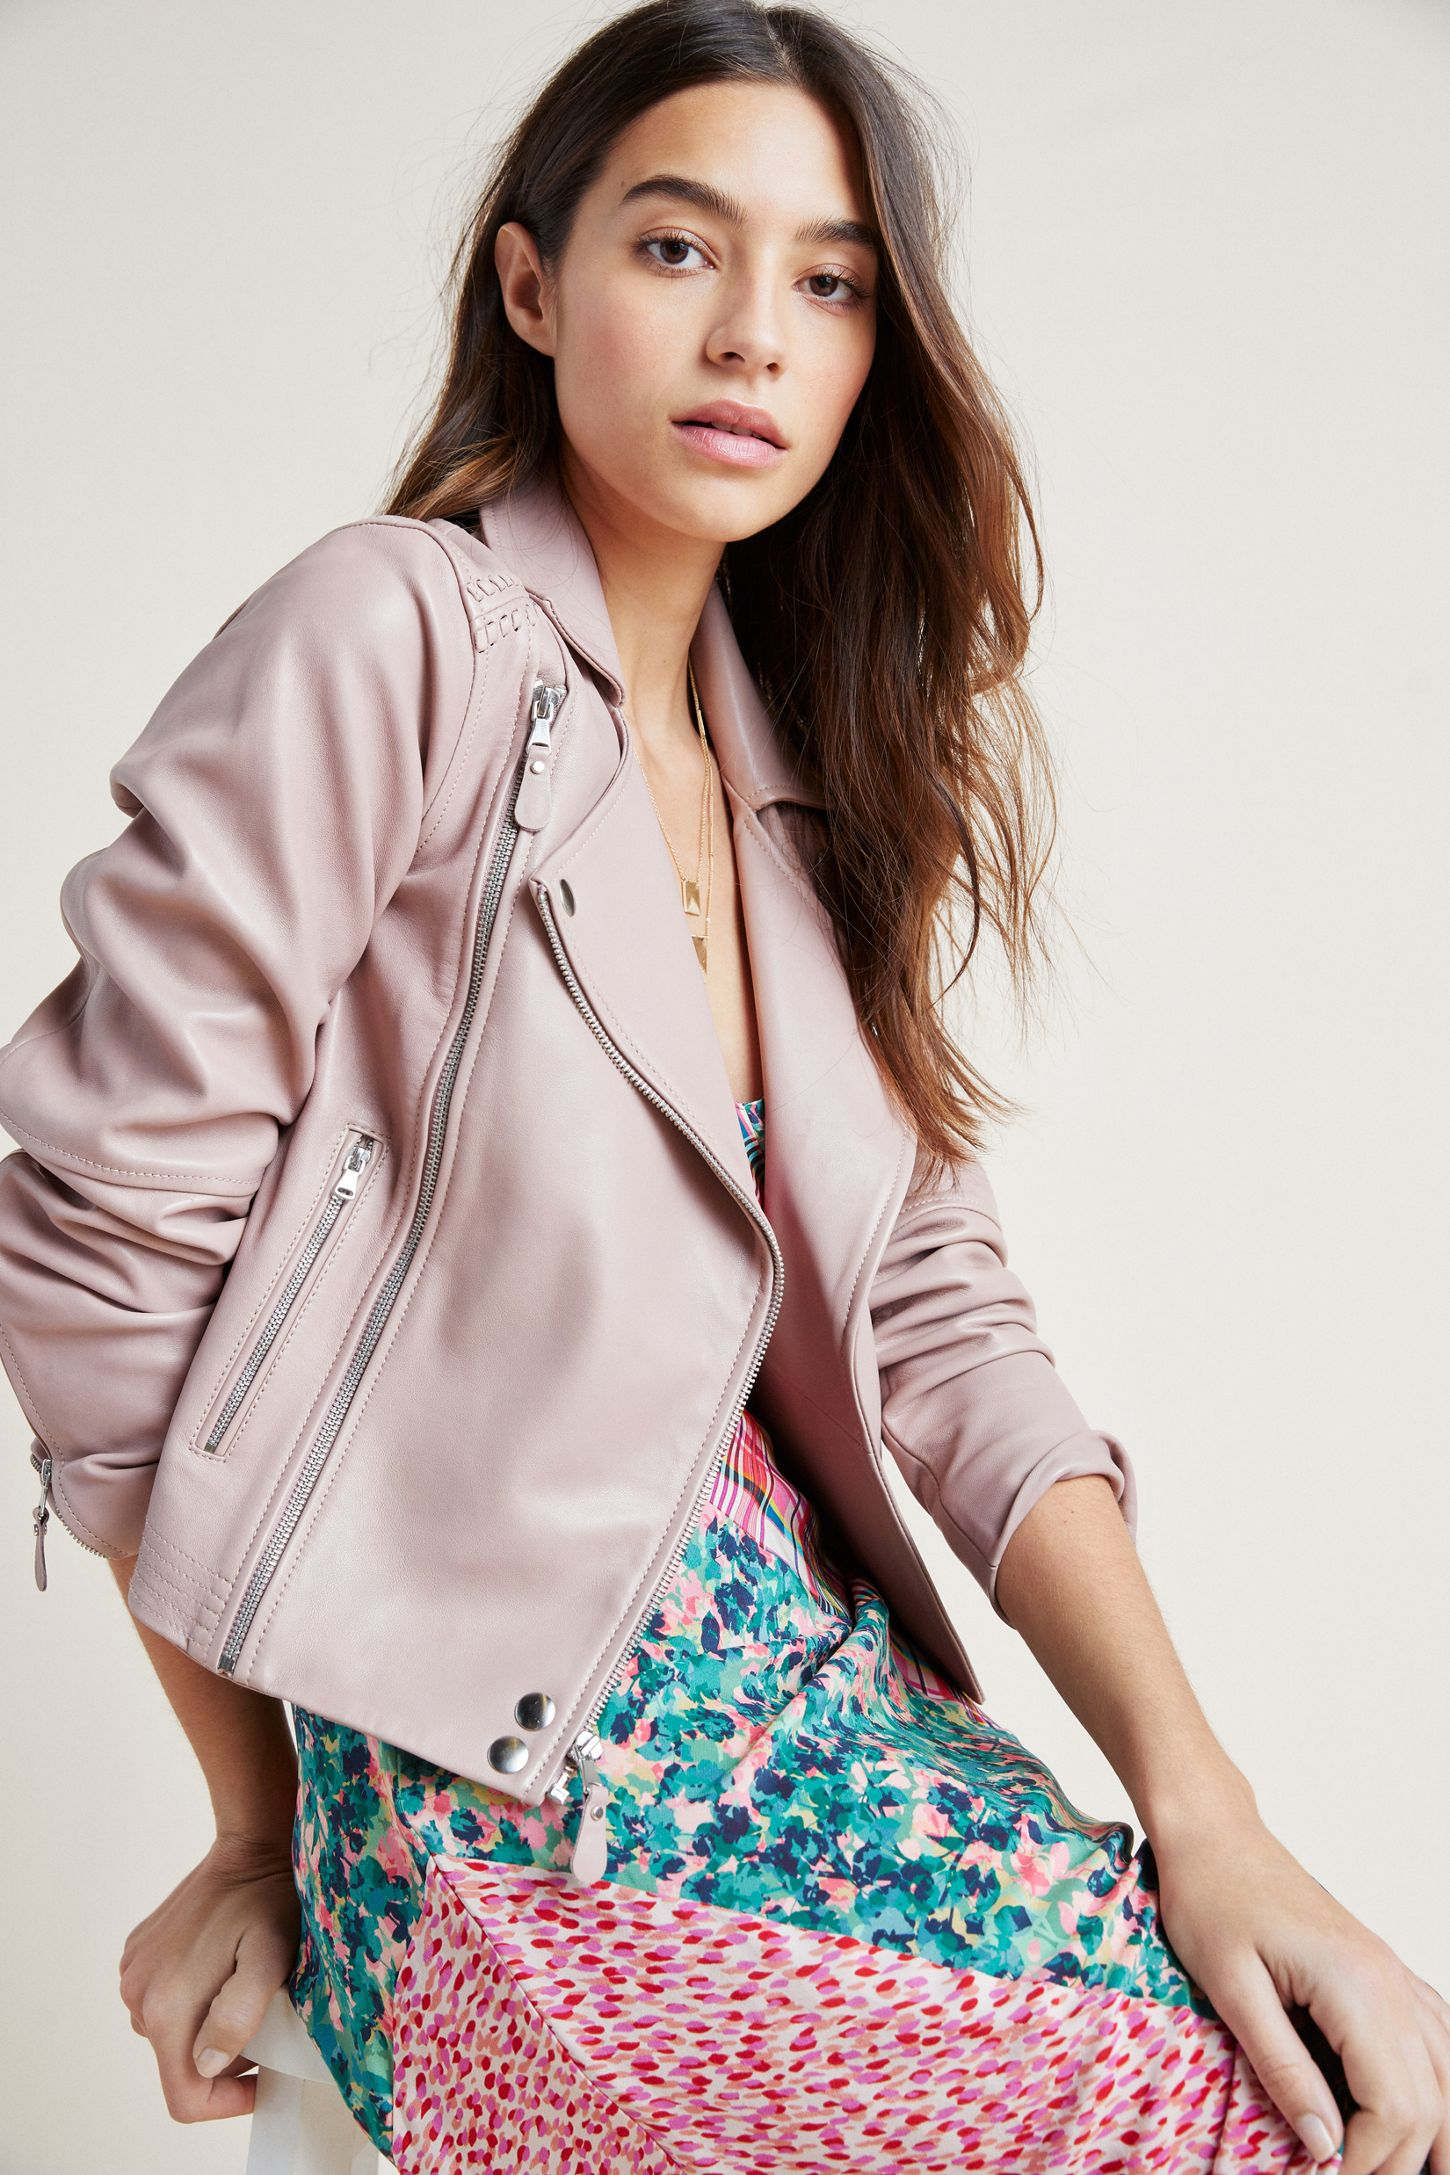 085d5c346b58 Paige Fontana Leather Jacket | Anthropologie